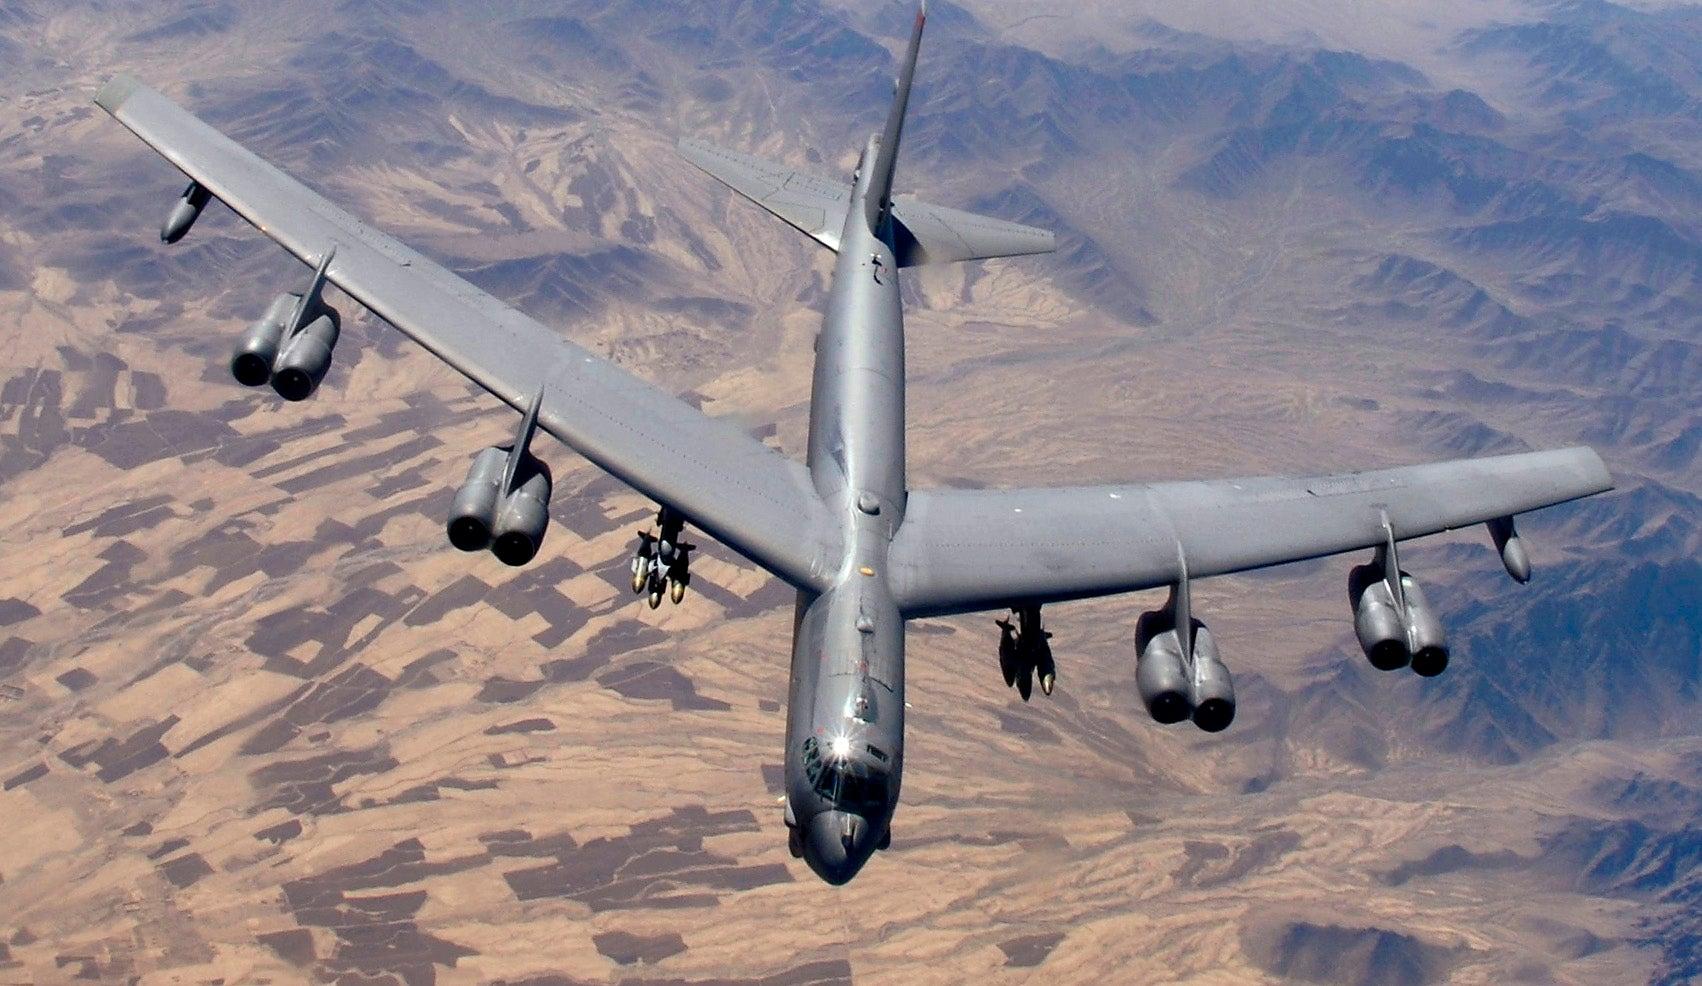 B 52 Re-Engine Its B-52 Fleet